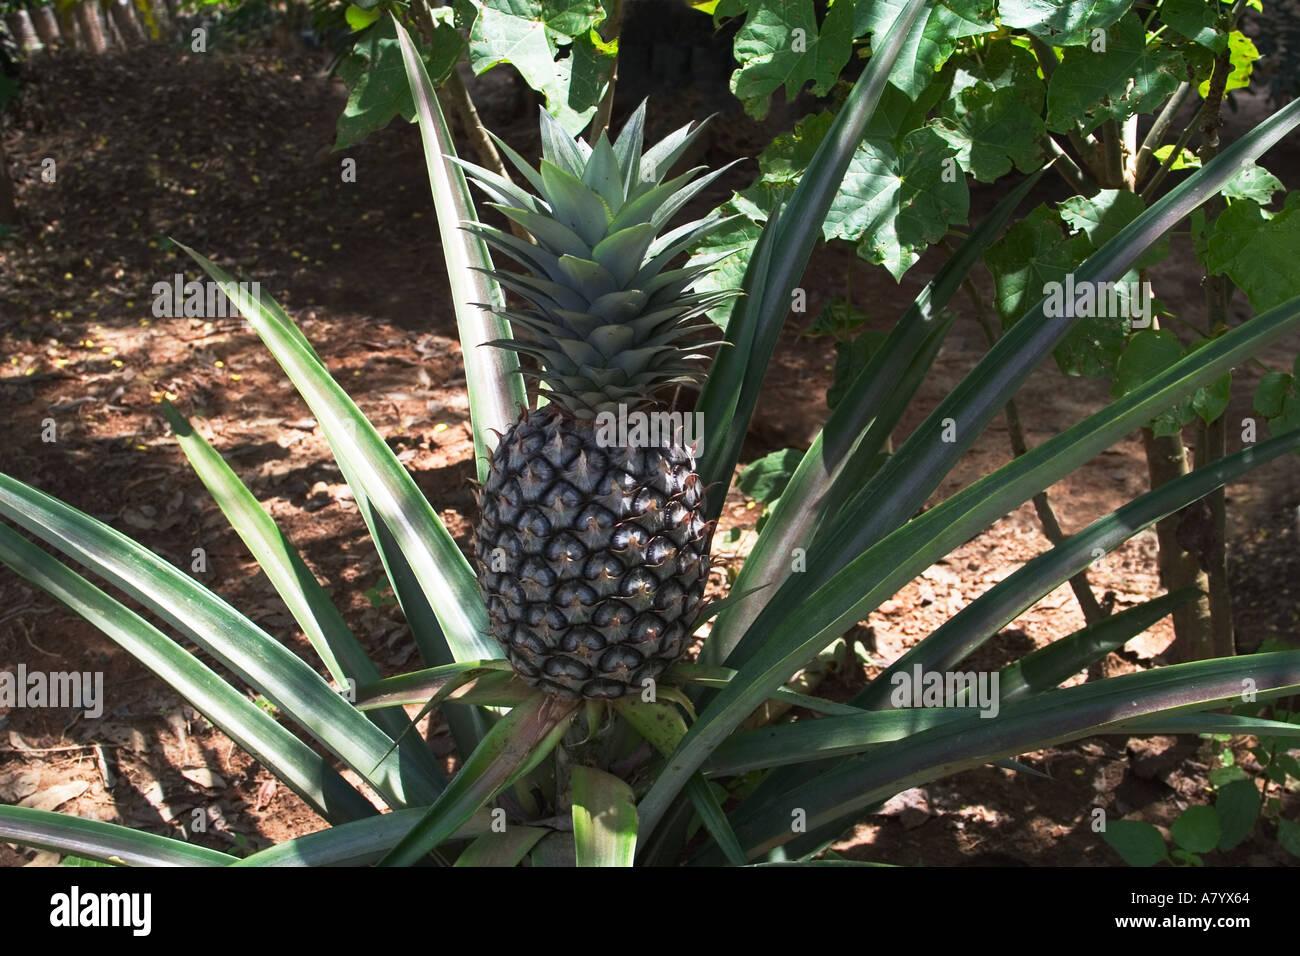 Ananas per fair trade export cresce in Ghana Africa occidentale Immagini Stock